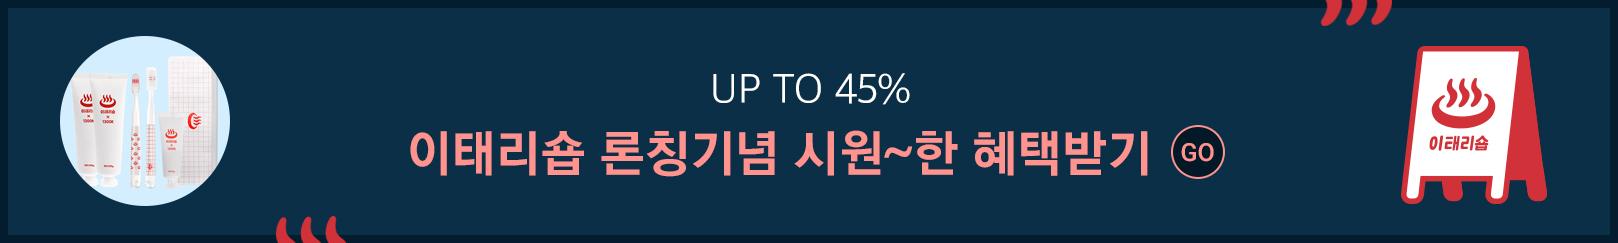 UP TO 45% 이태리숍 론칭기념 시원~한 혜택받기 GO